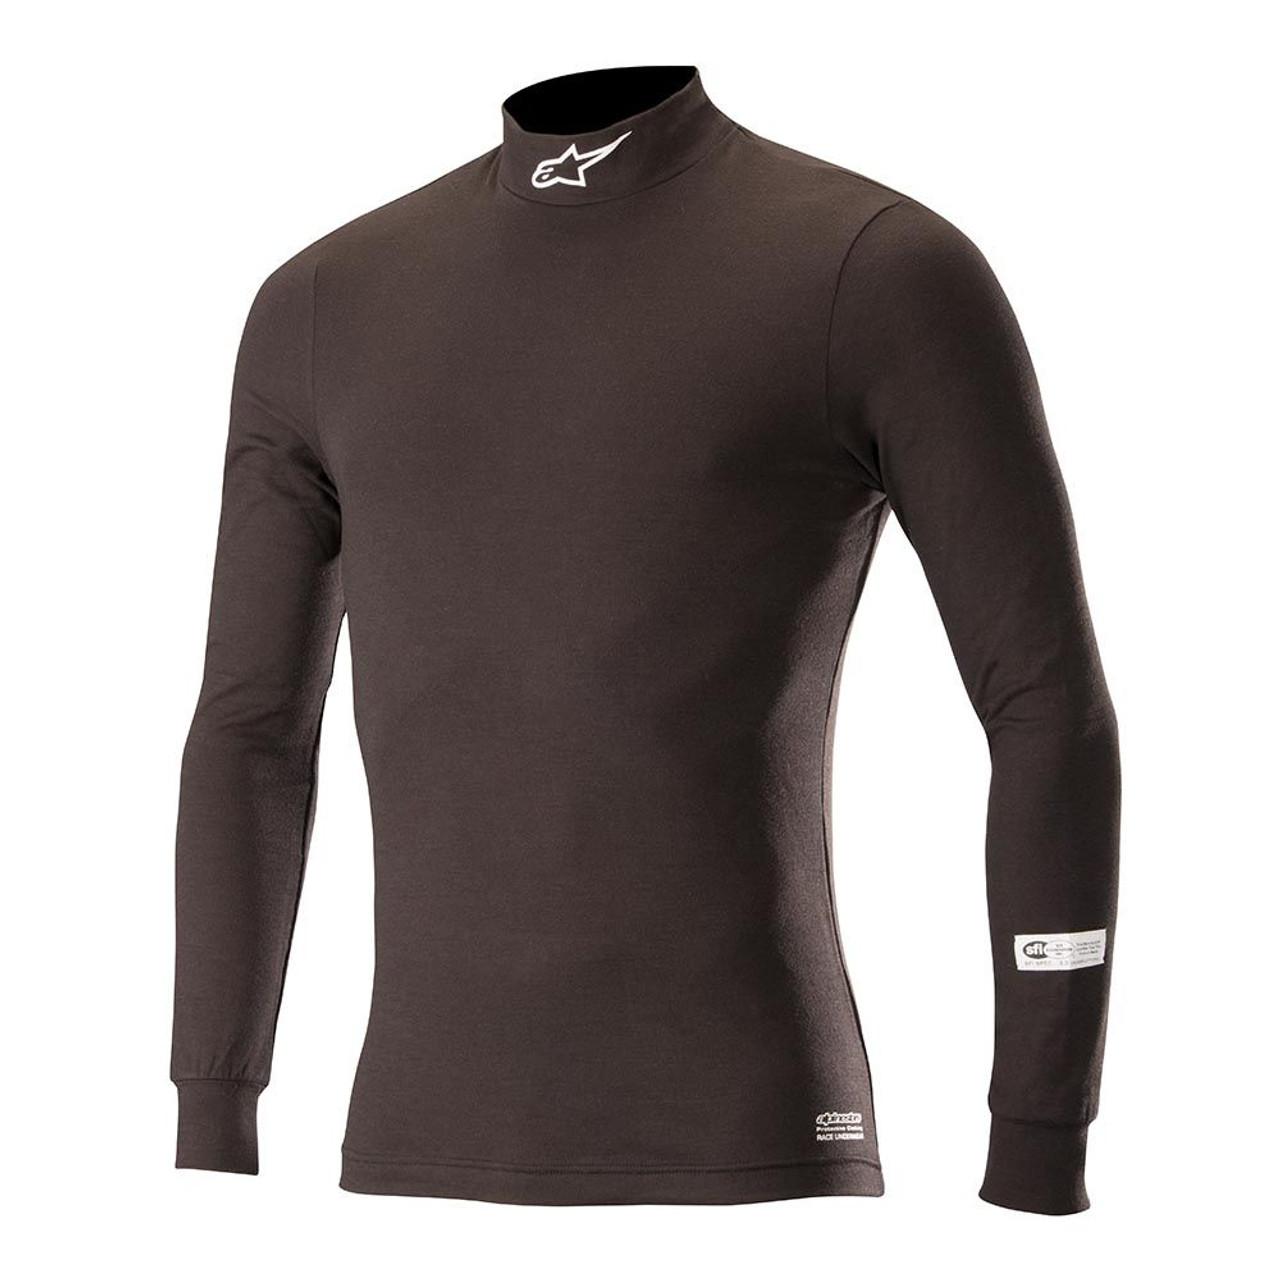 Alpinestars Race V2 Long Sleeve Top - black